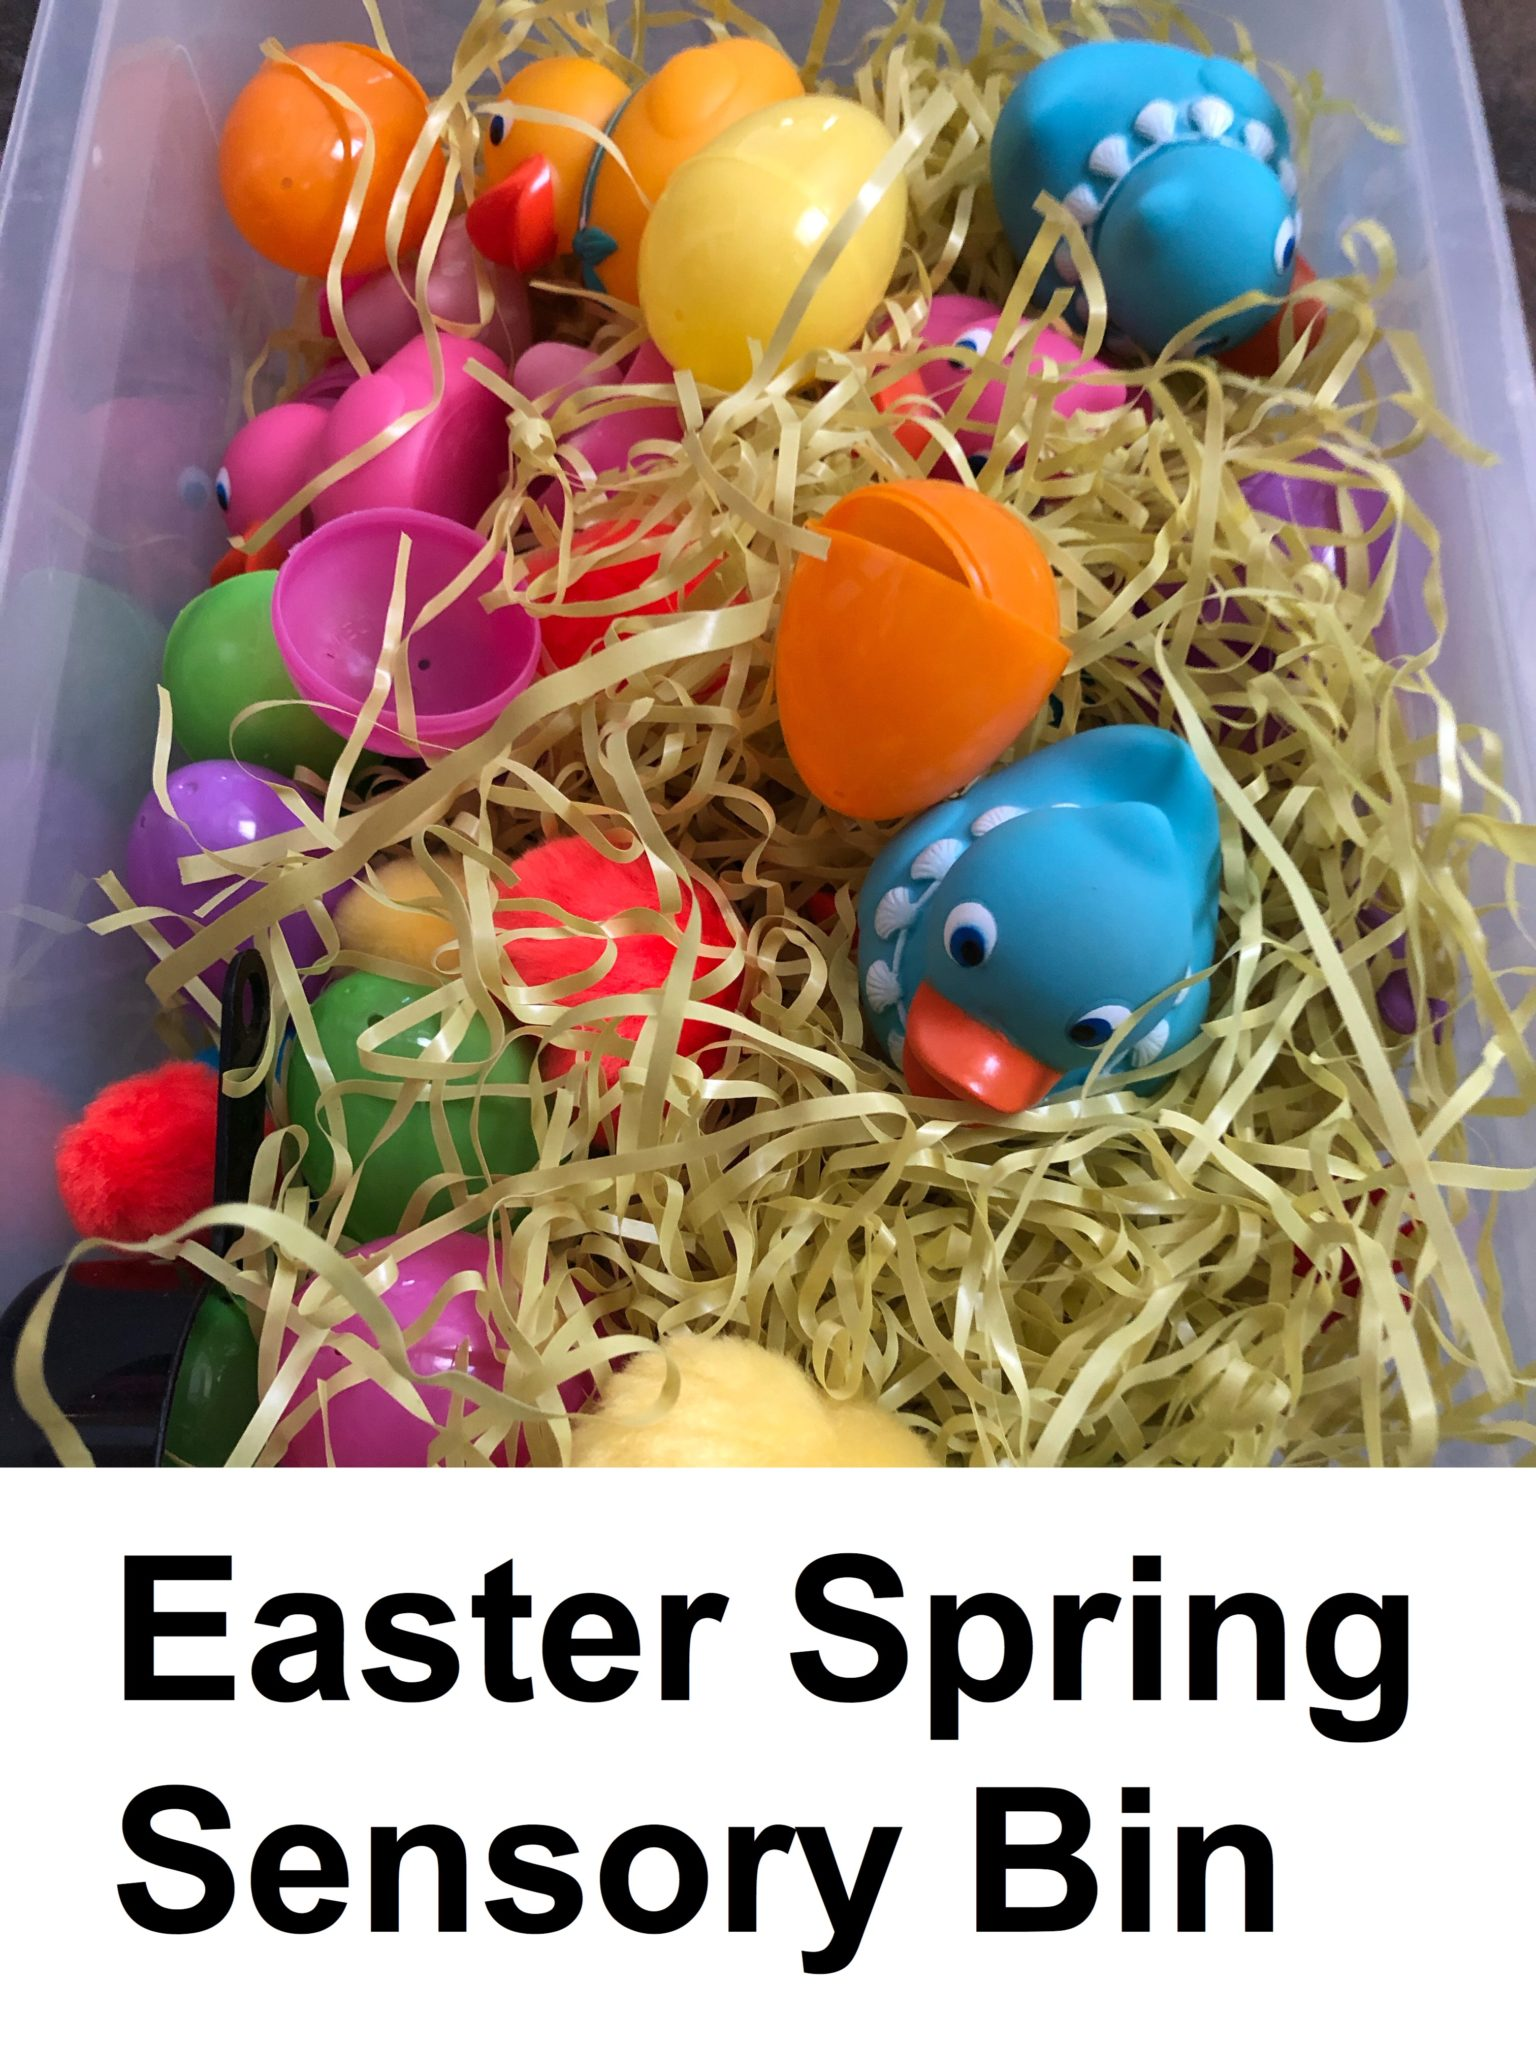 Easter Spring Sensory Bin pin